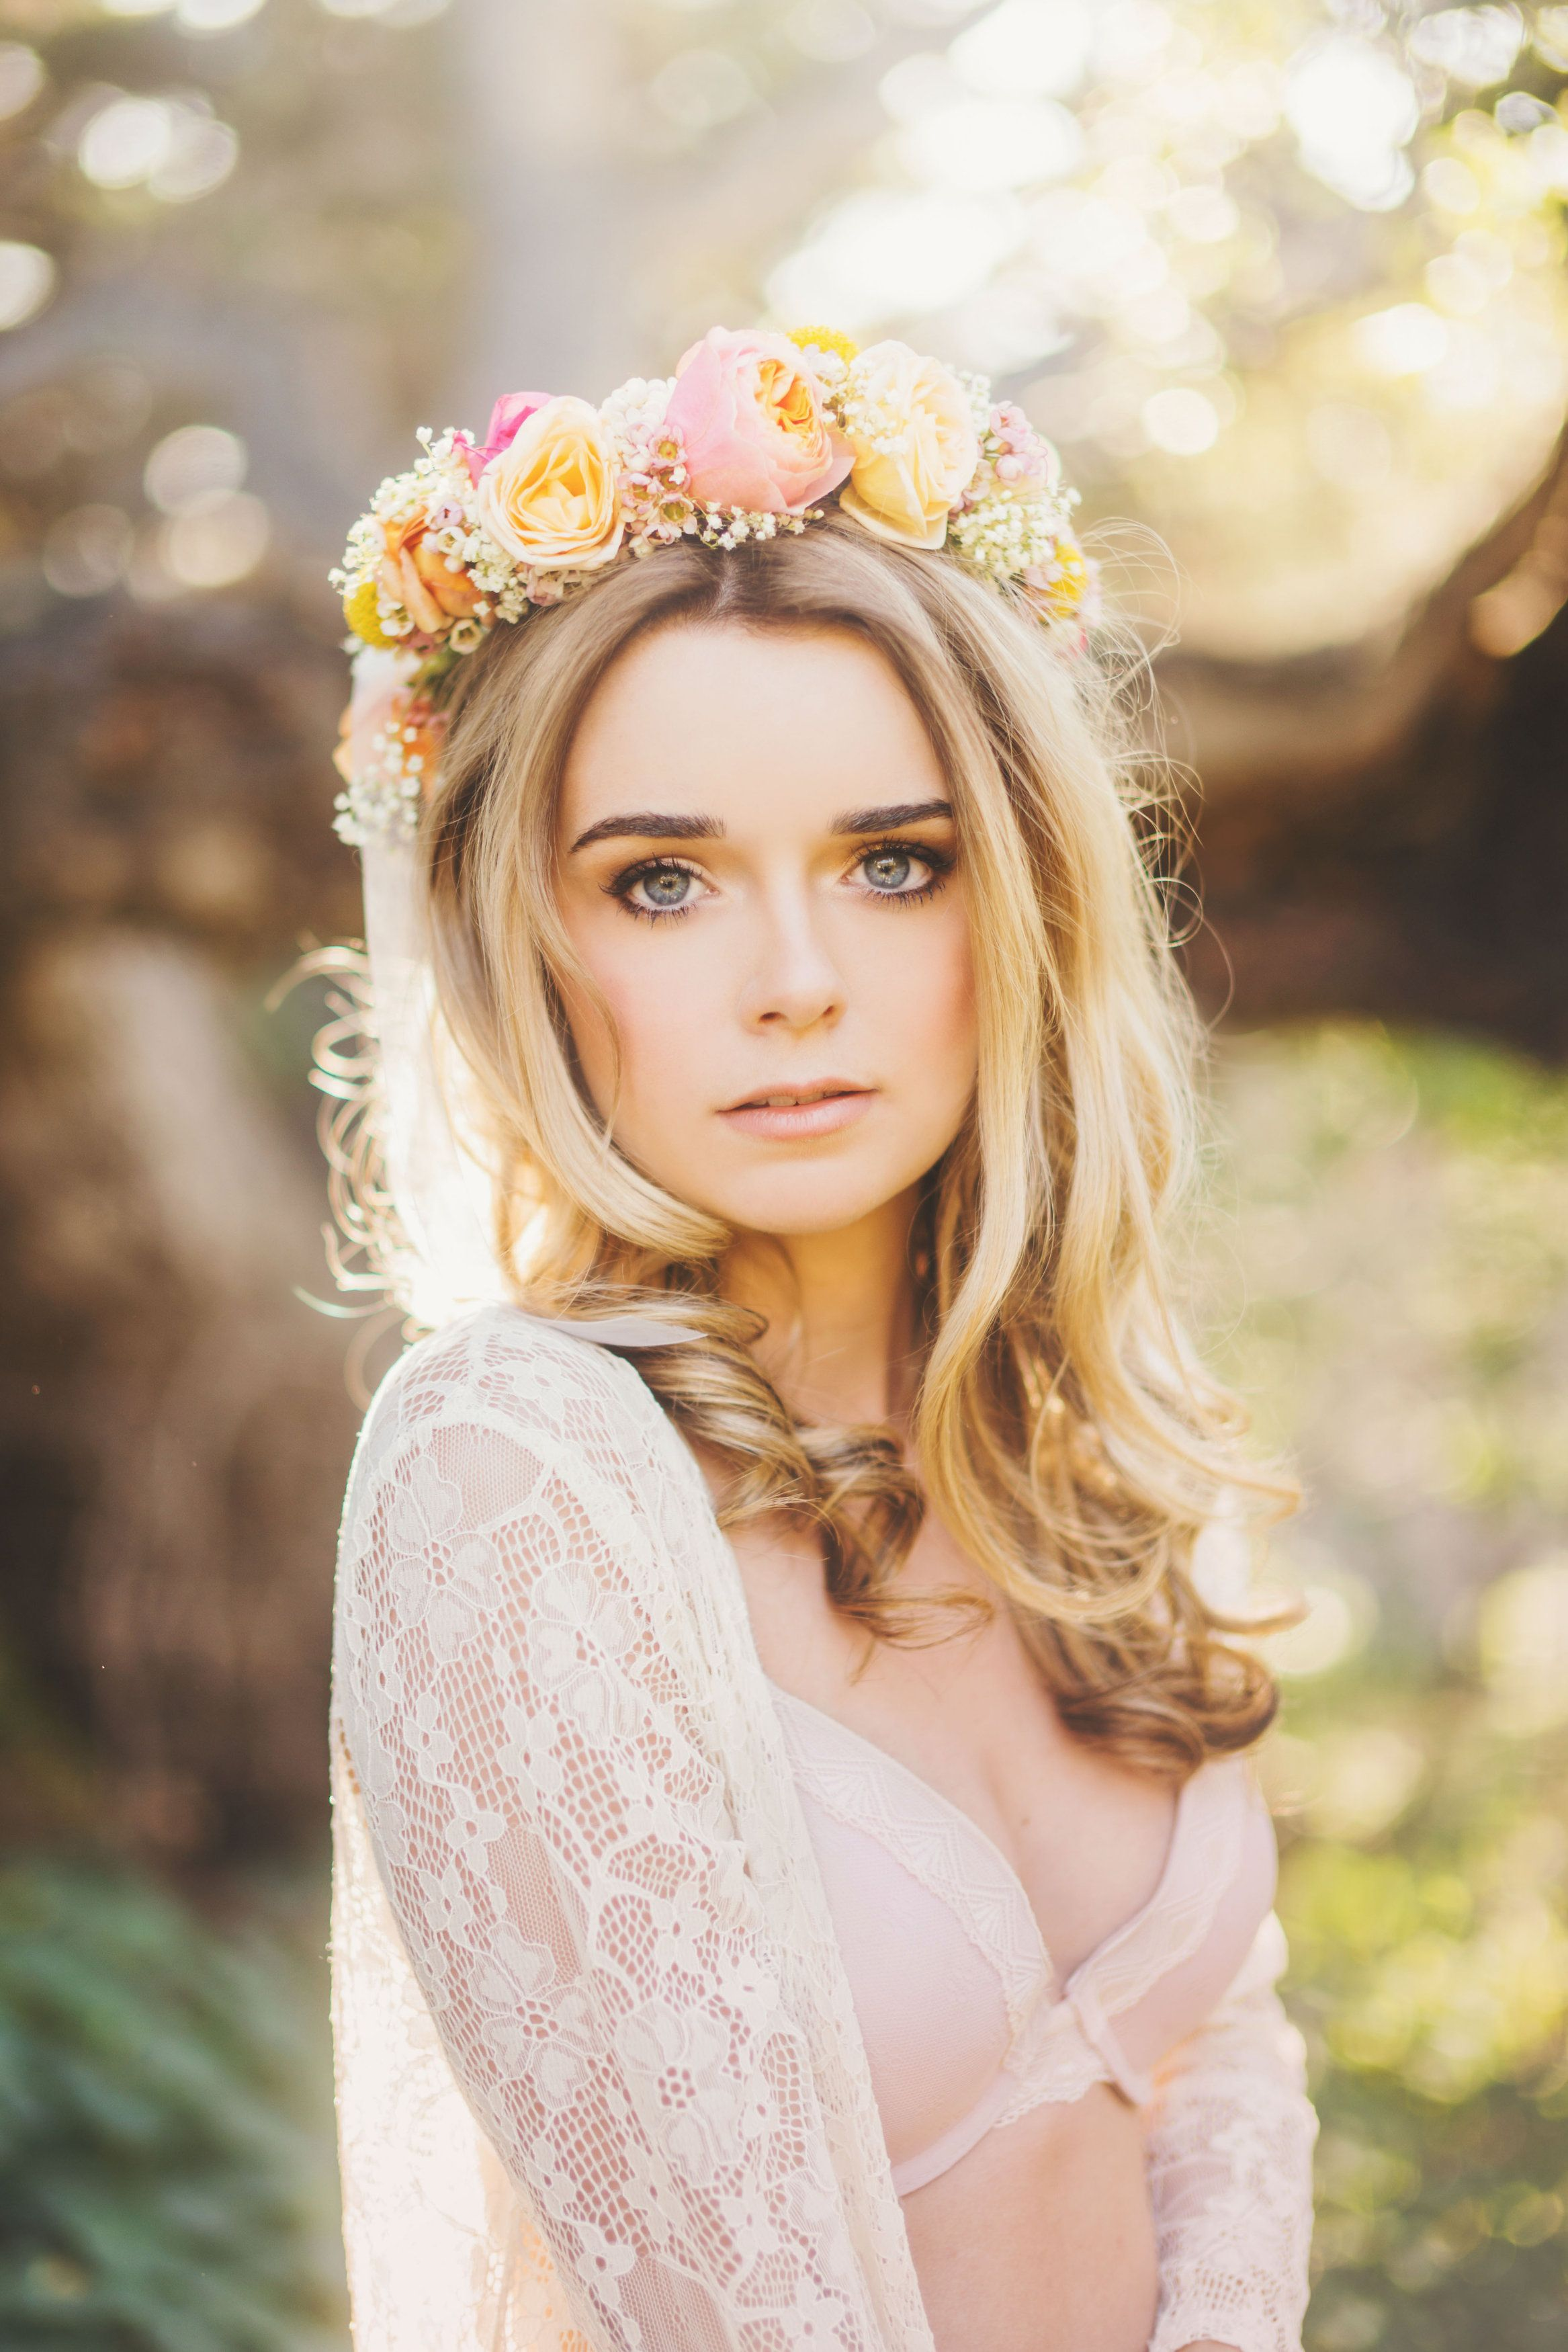 Boudoir Photoshoot/ Michelle Roller Photography/ Blissful Blossoms #Boudoir #Photoshoot #MichelleRollerPhototgraphy #Photography #flowercrown #blissfulBlossoms #CentralCoast